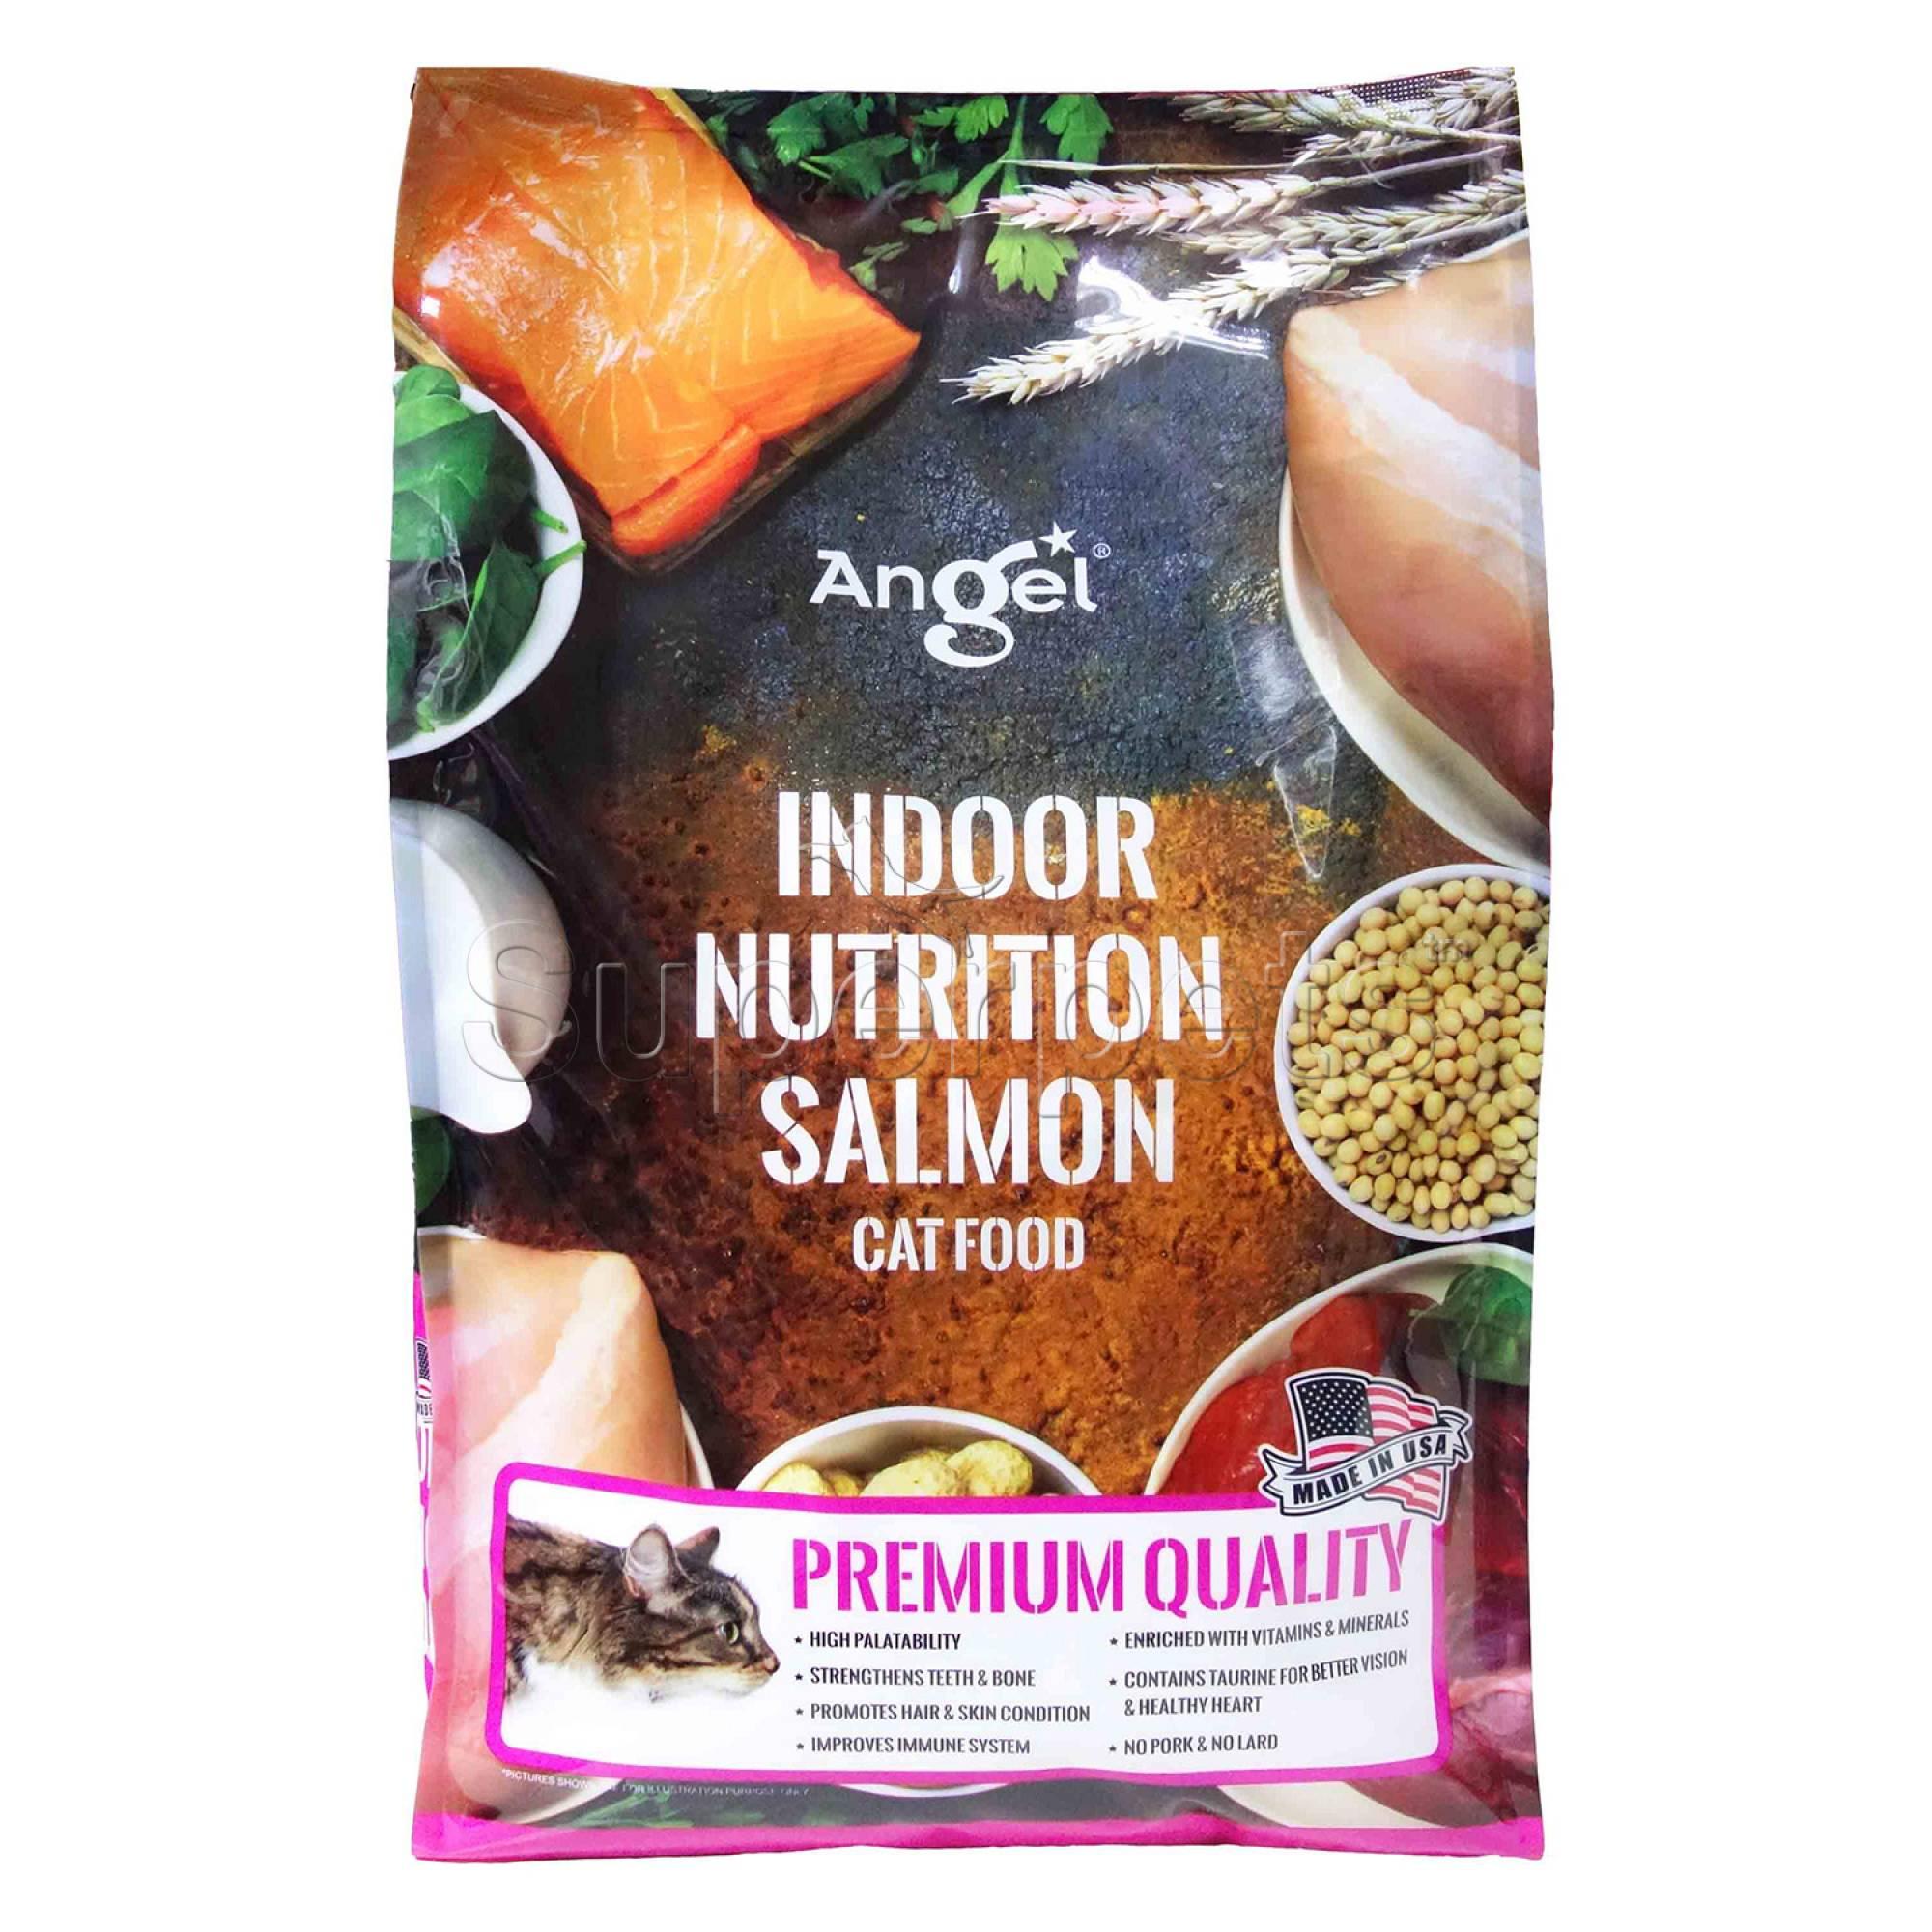 Angel - Indoor Nutrition Salmon Cat Food 4.8kg